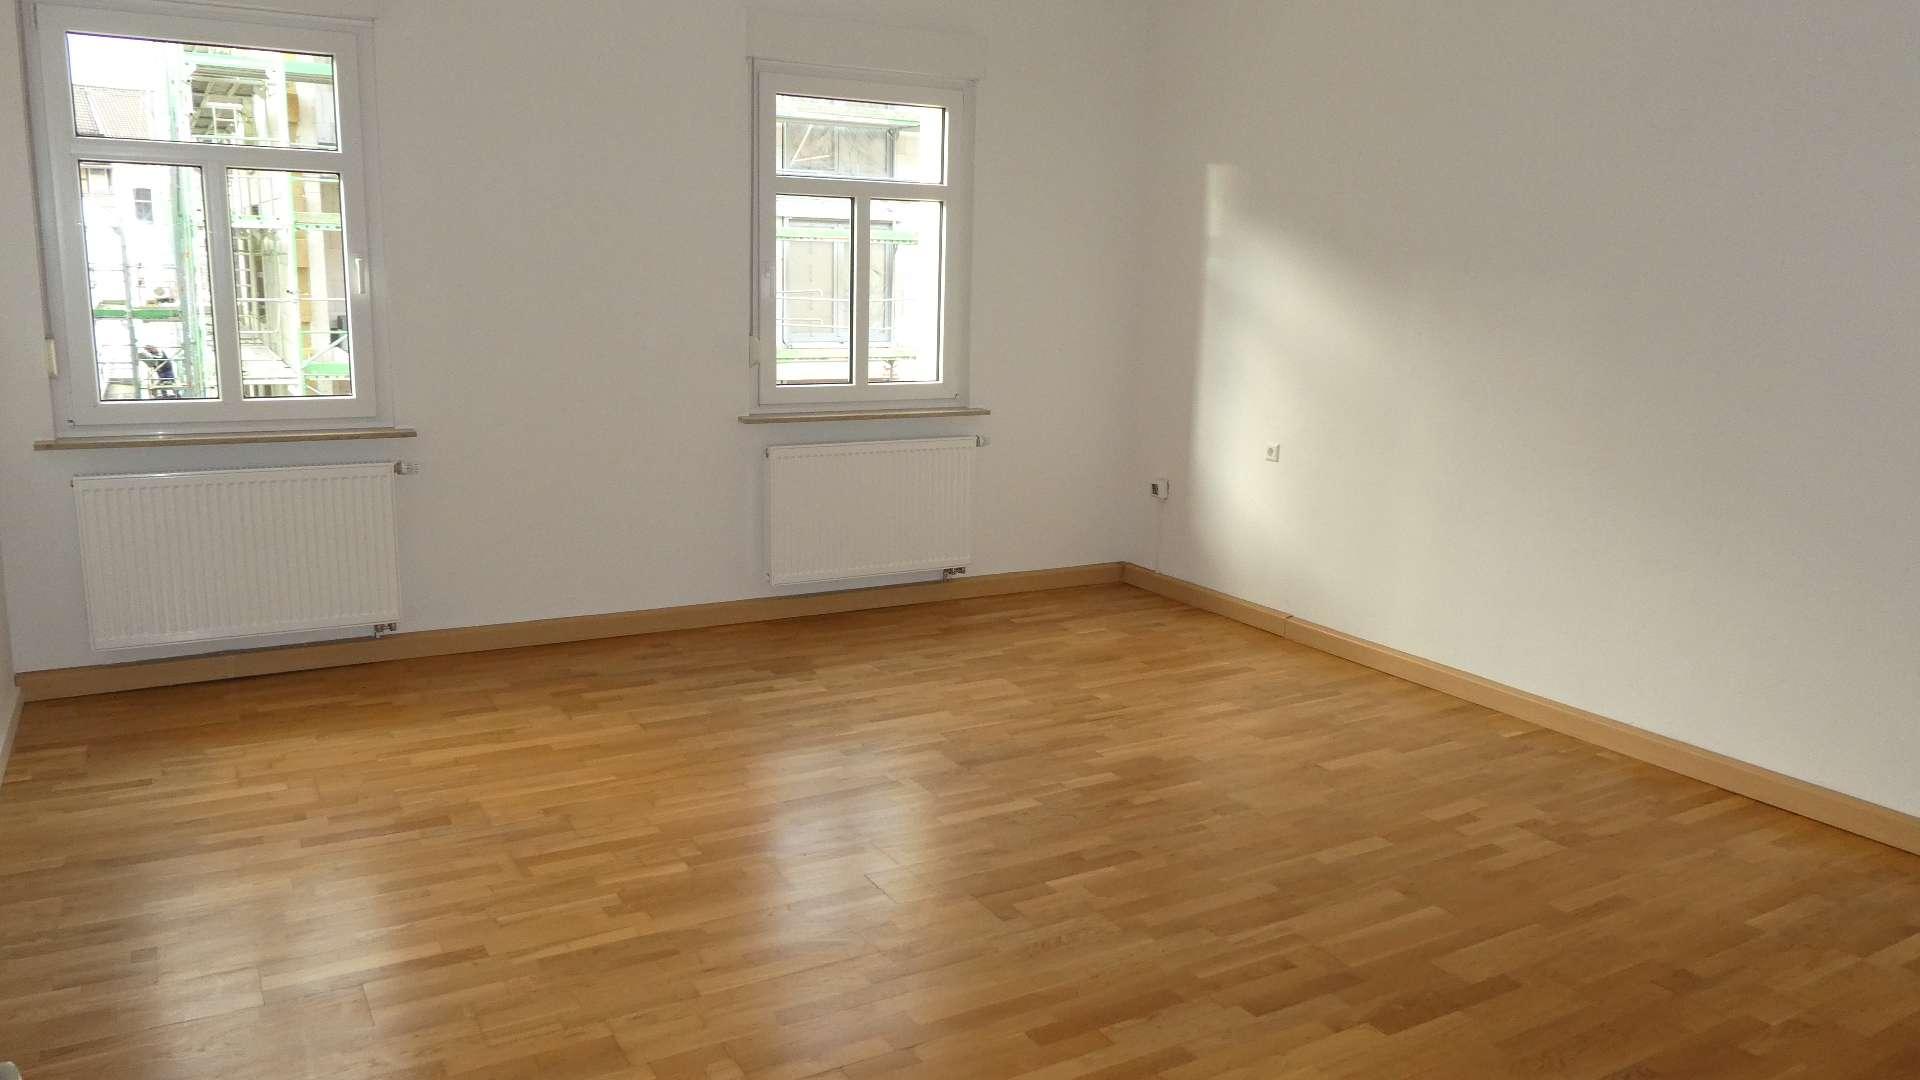 N-Muggenhof ! Sanierte chice 2-Zi-Altbau-Whg. ca. 76 m², 2.OG ohne Aufzug in